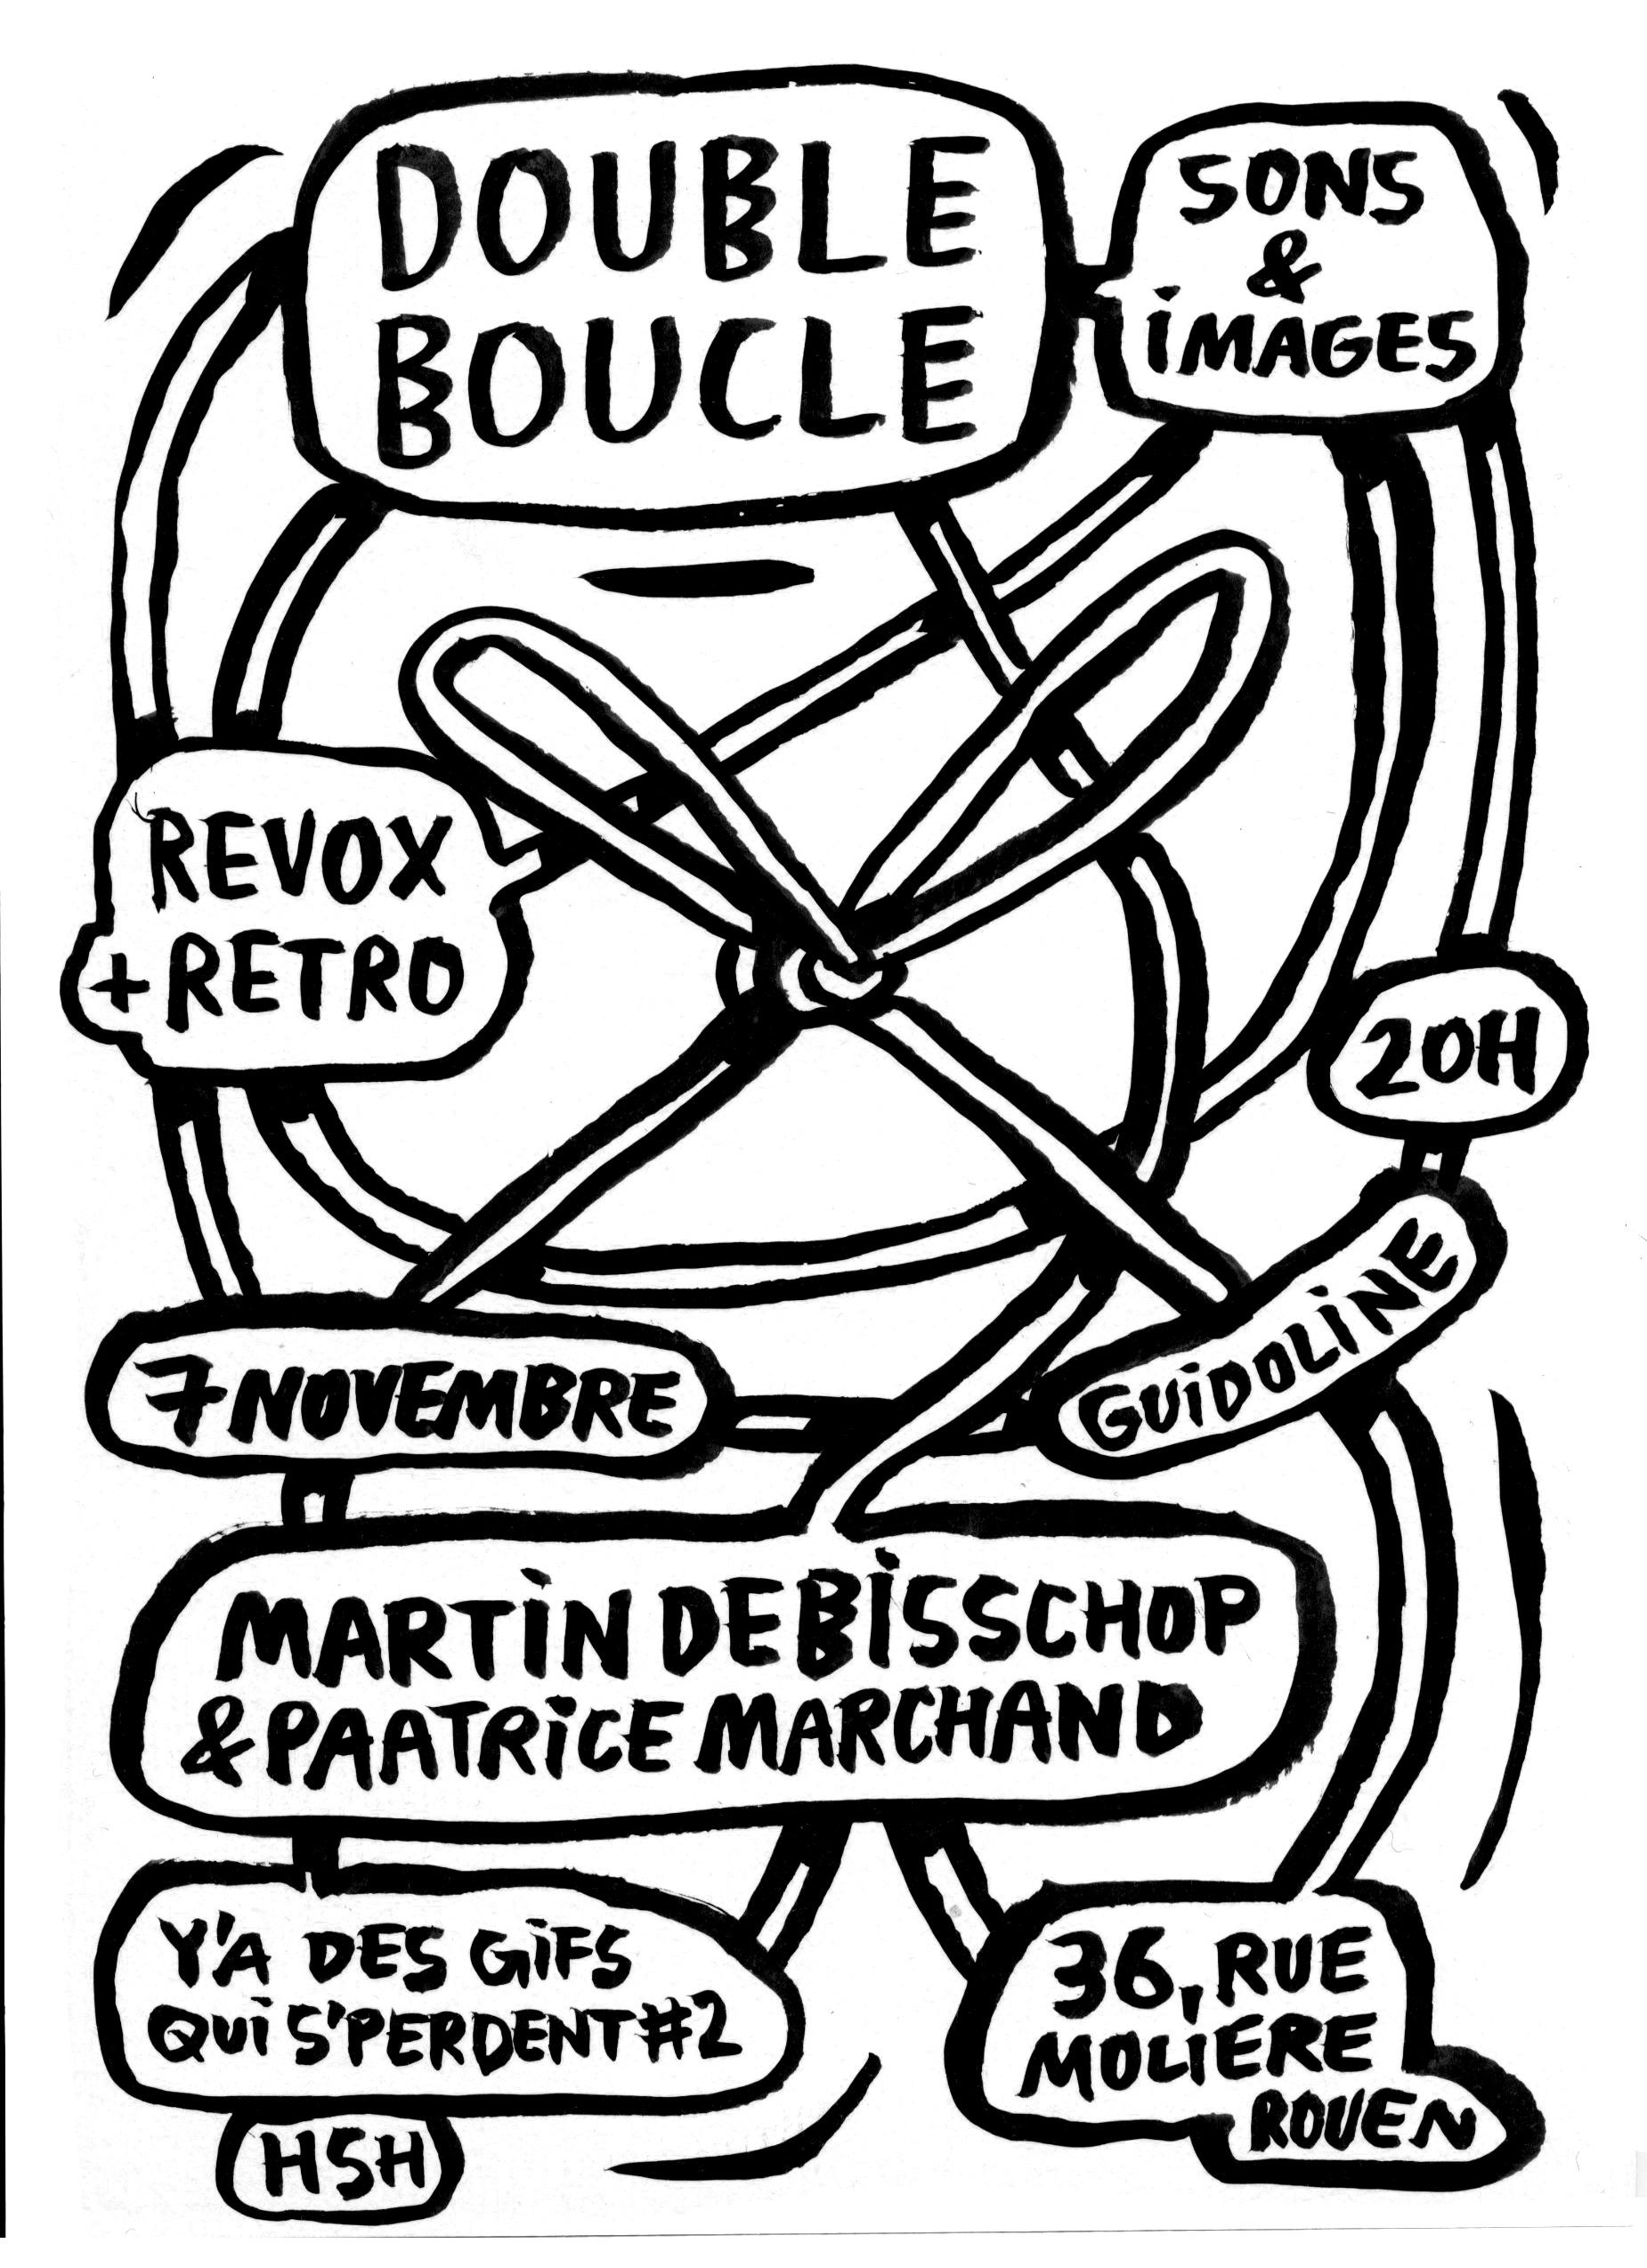 double boucle performance